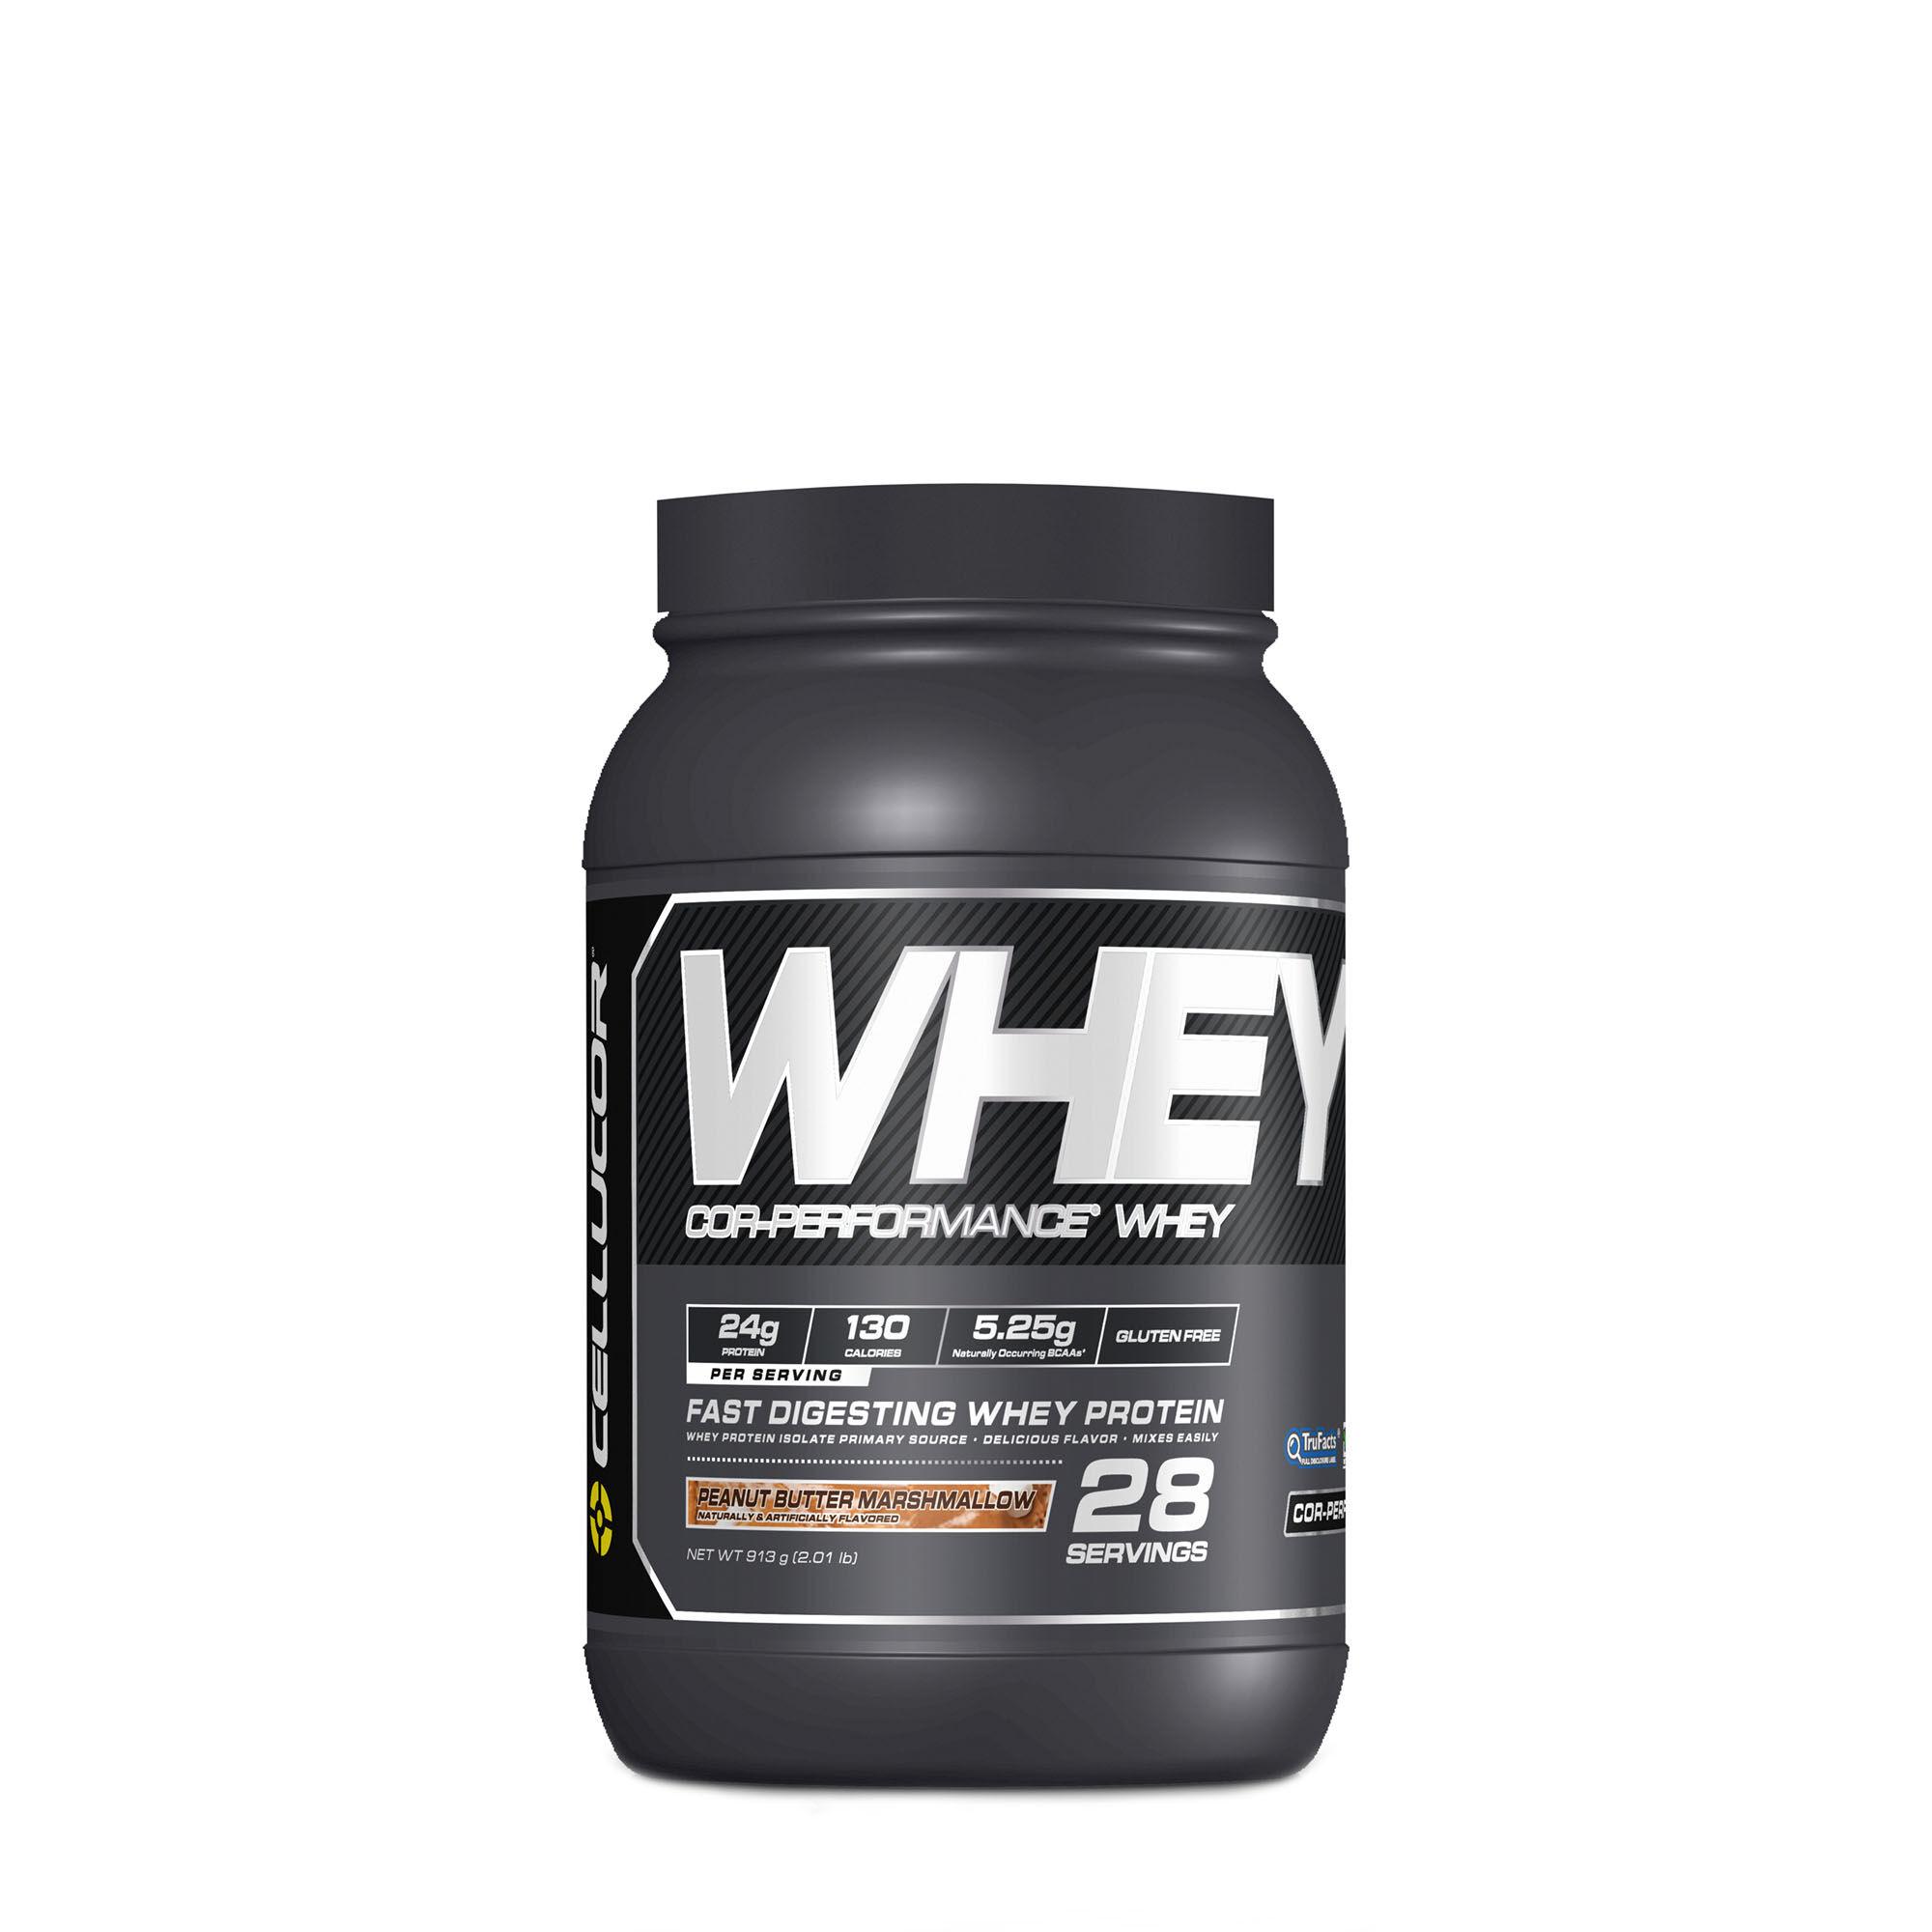 Cellucor Cor Performance Whey Protein Gnc